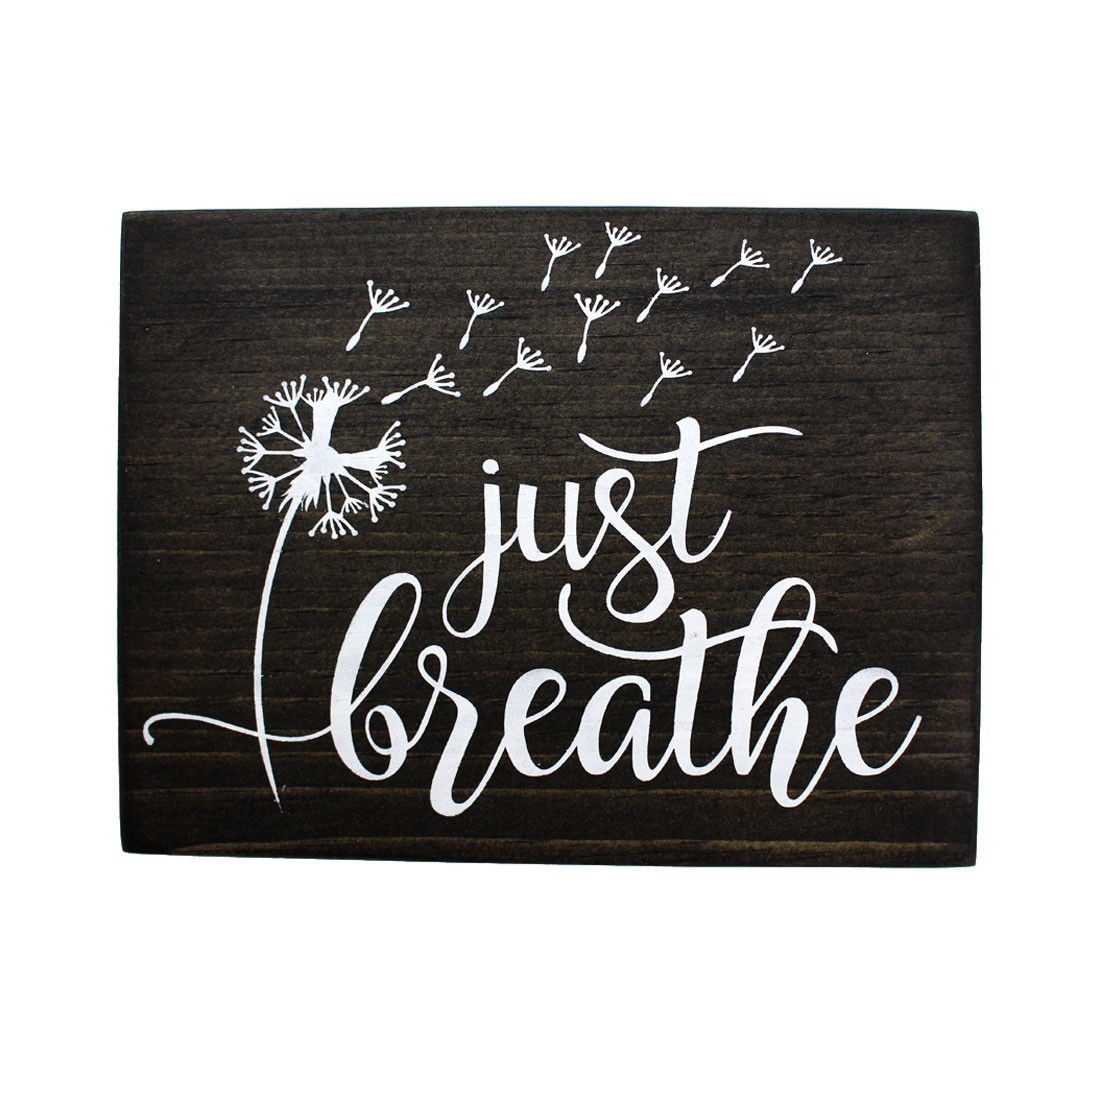 Frontside of Just Breathe wooden sign.